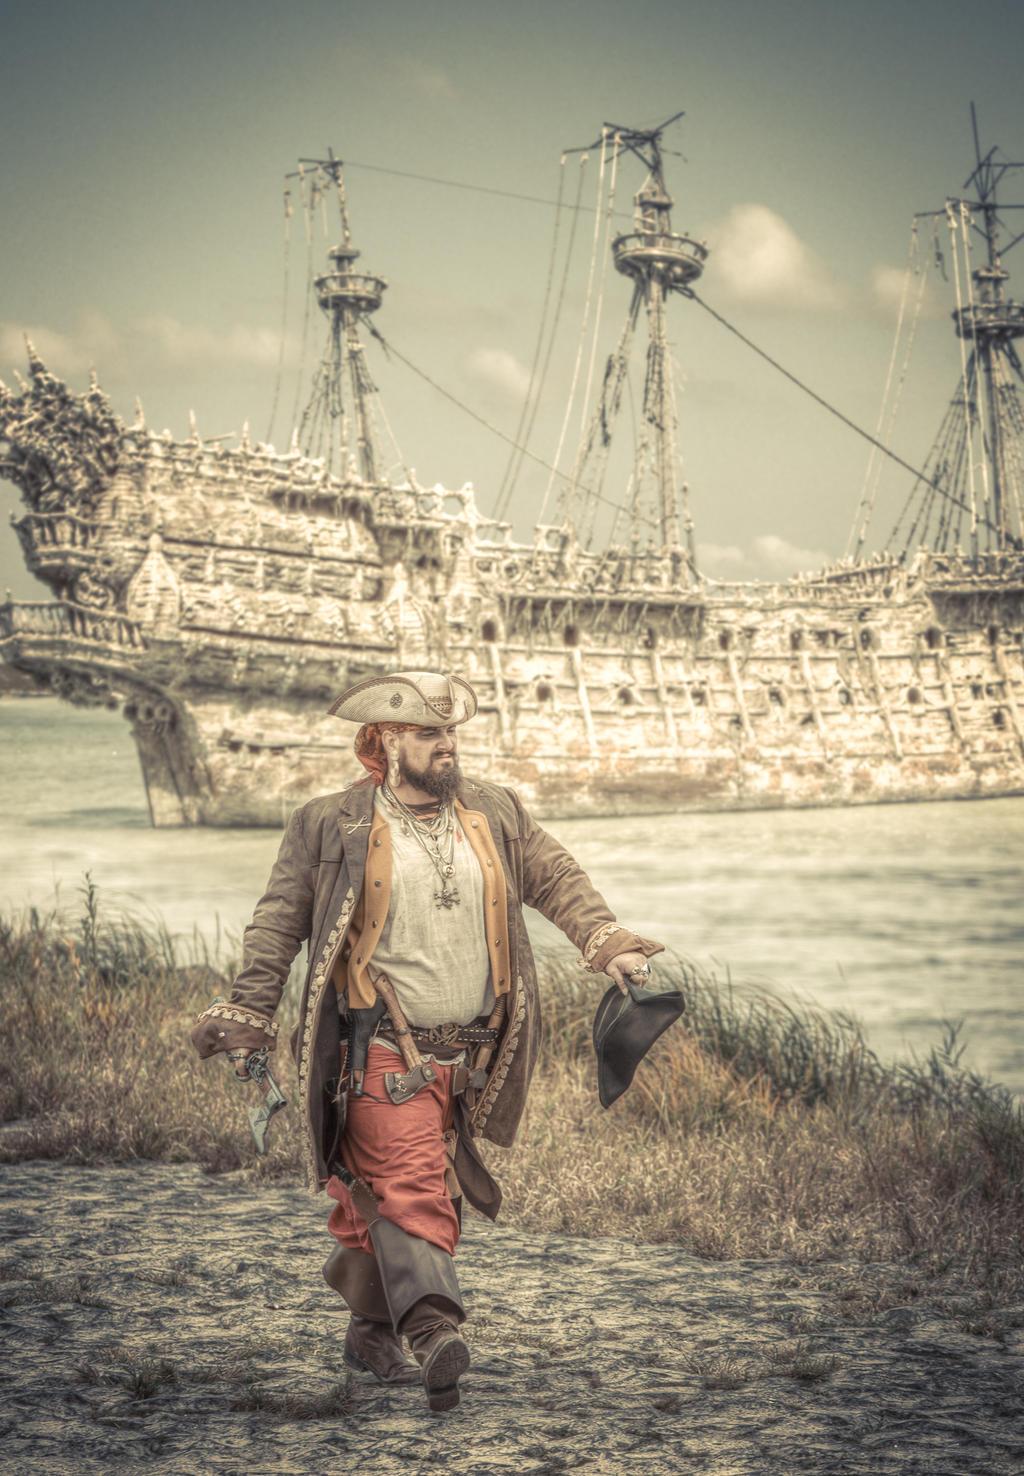 Pirate by ChristianBT